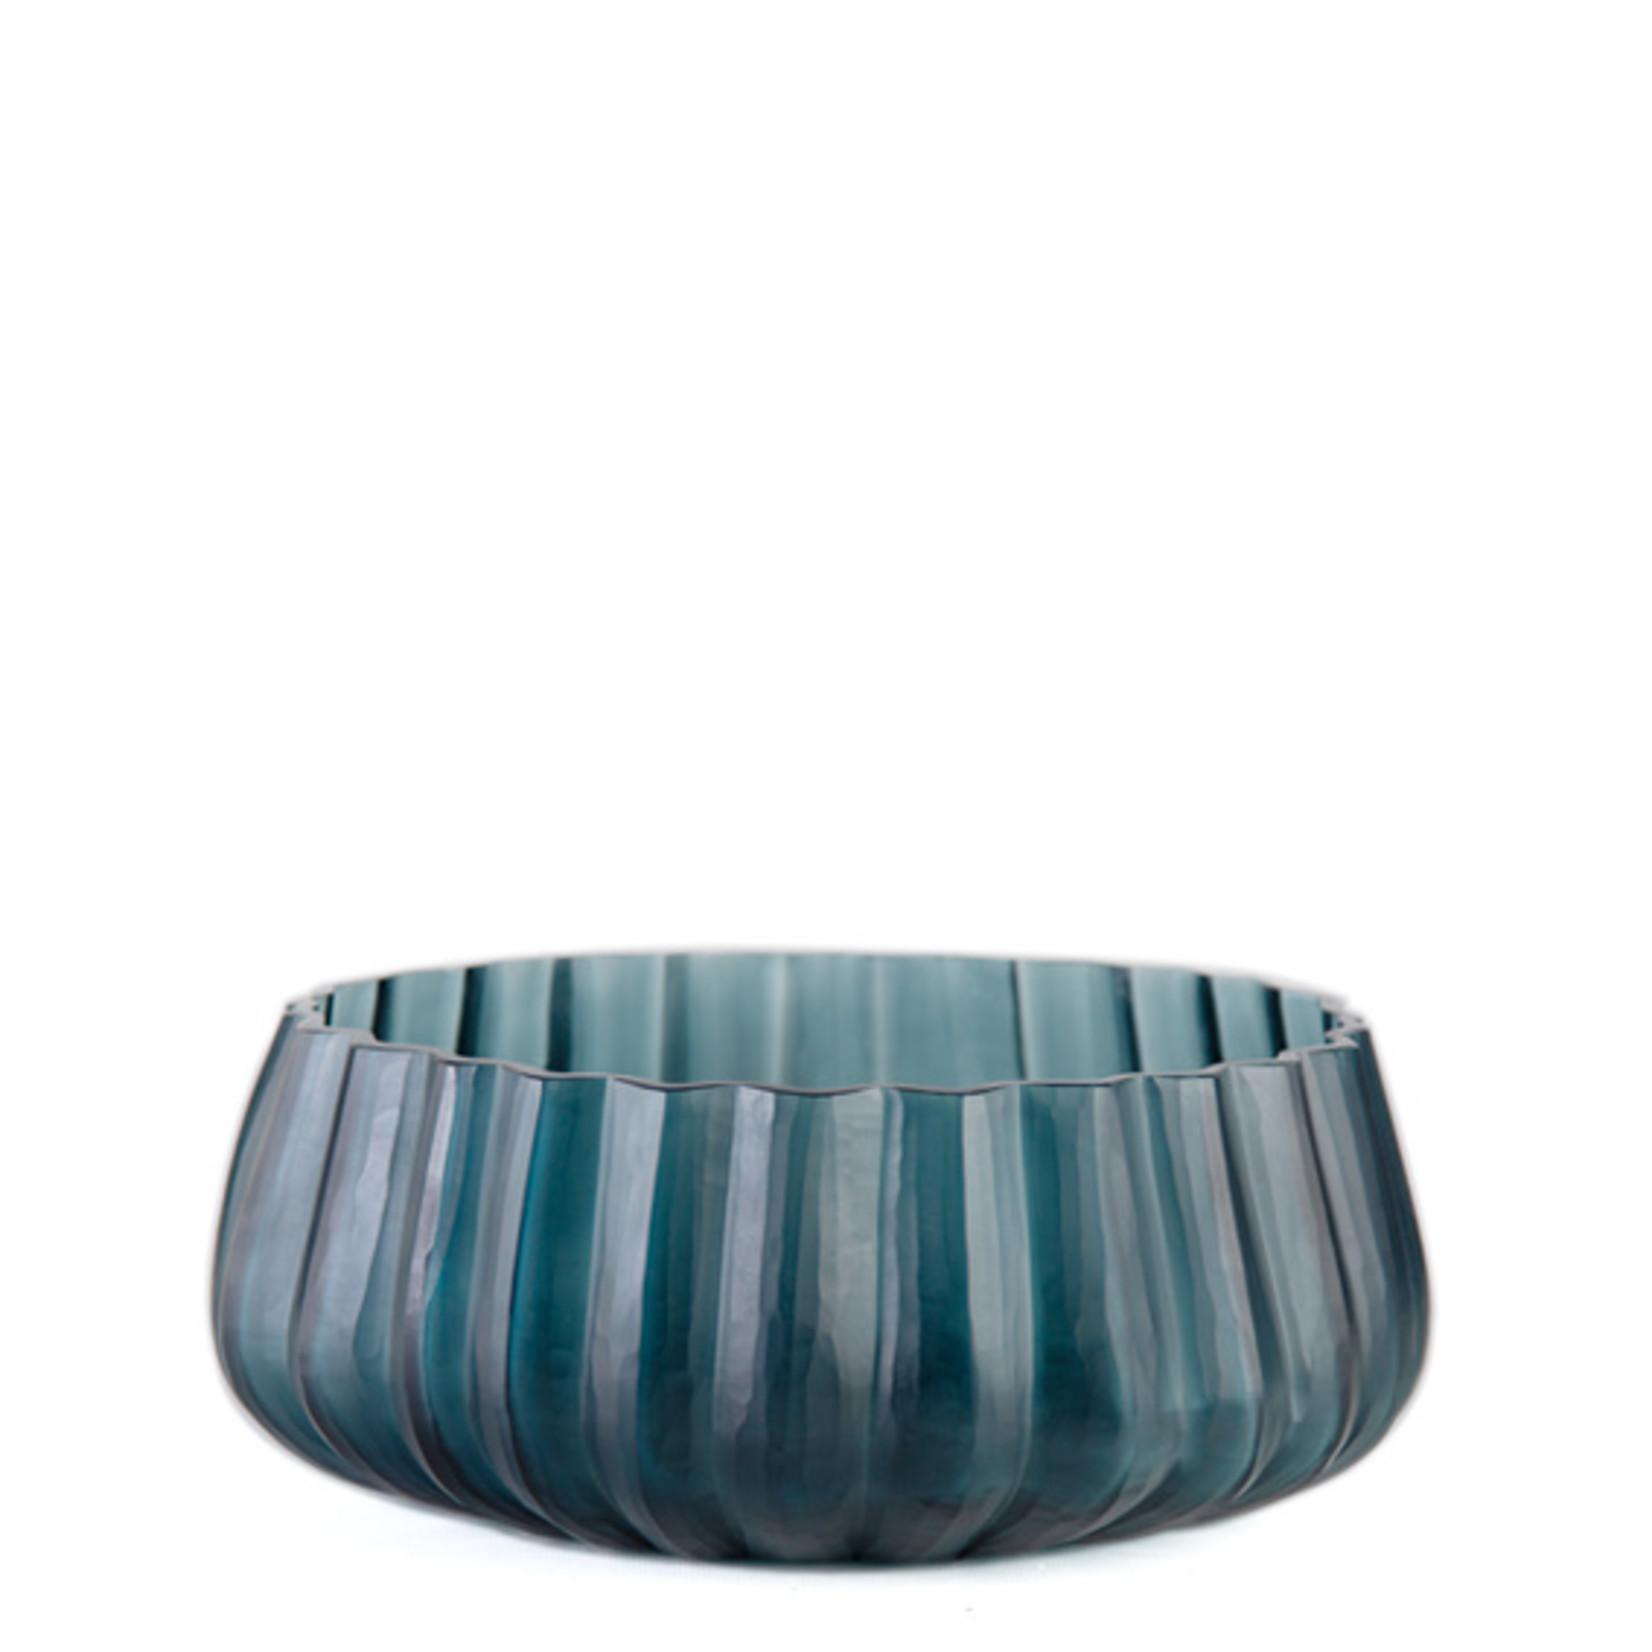 Guaxs Bowl Manakara   Ocean Blue / Indigo